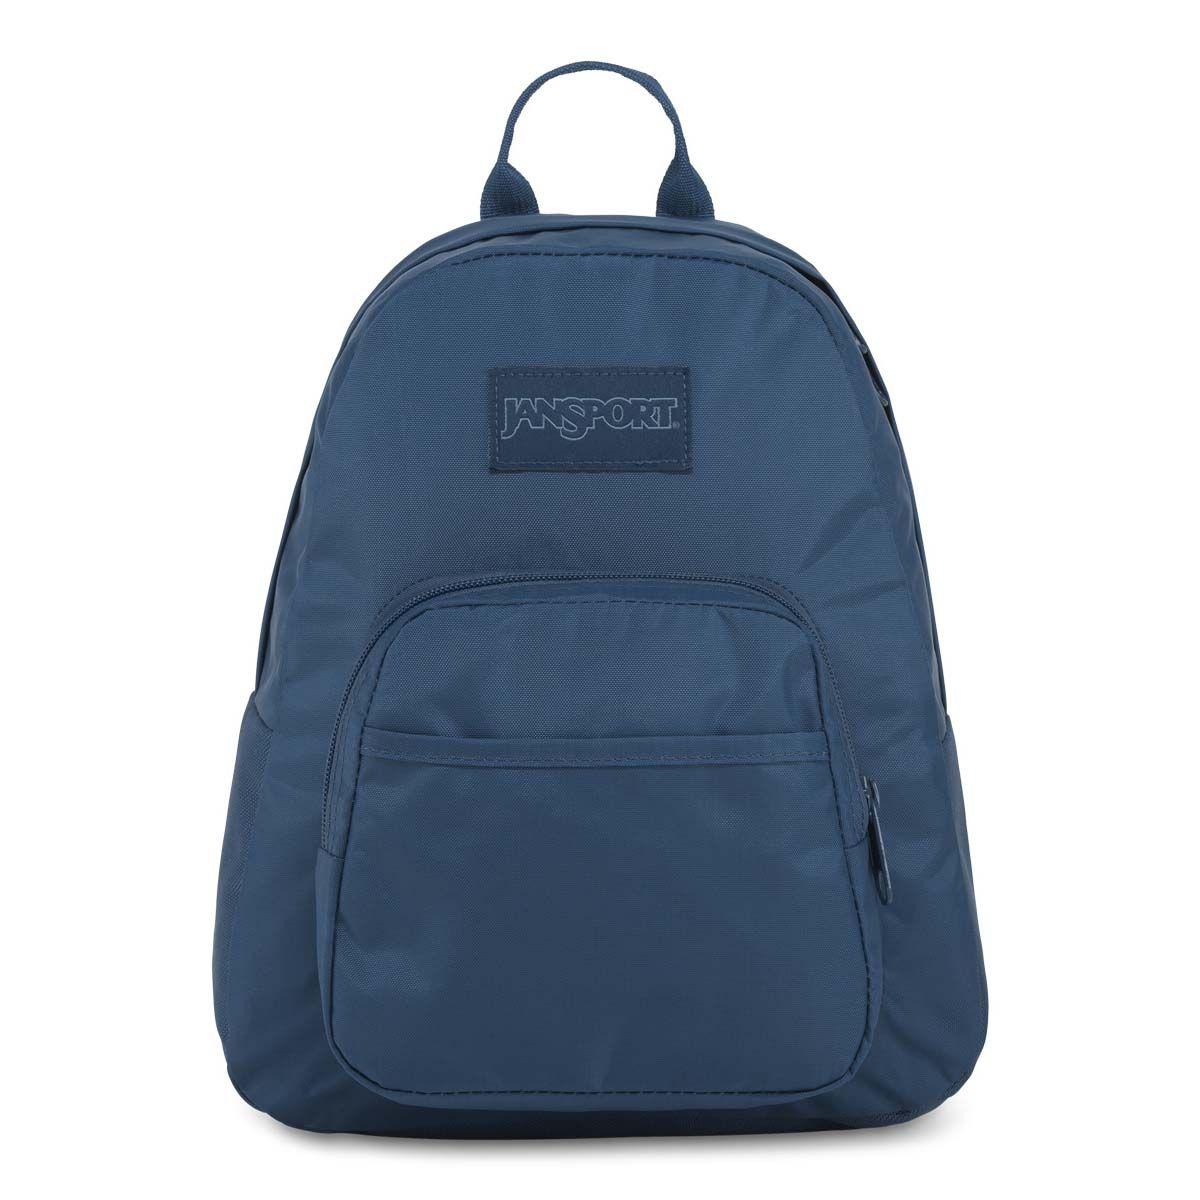 JanSport Mono Half Pint Mini Backpack in Dark Denim Blue